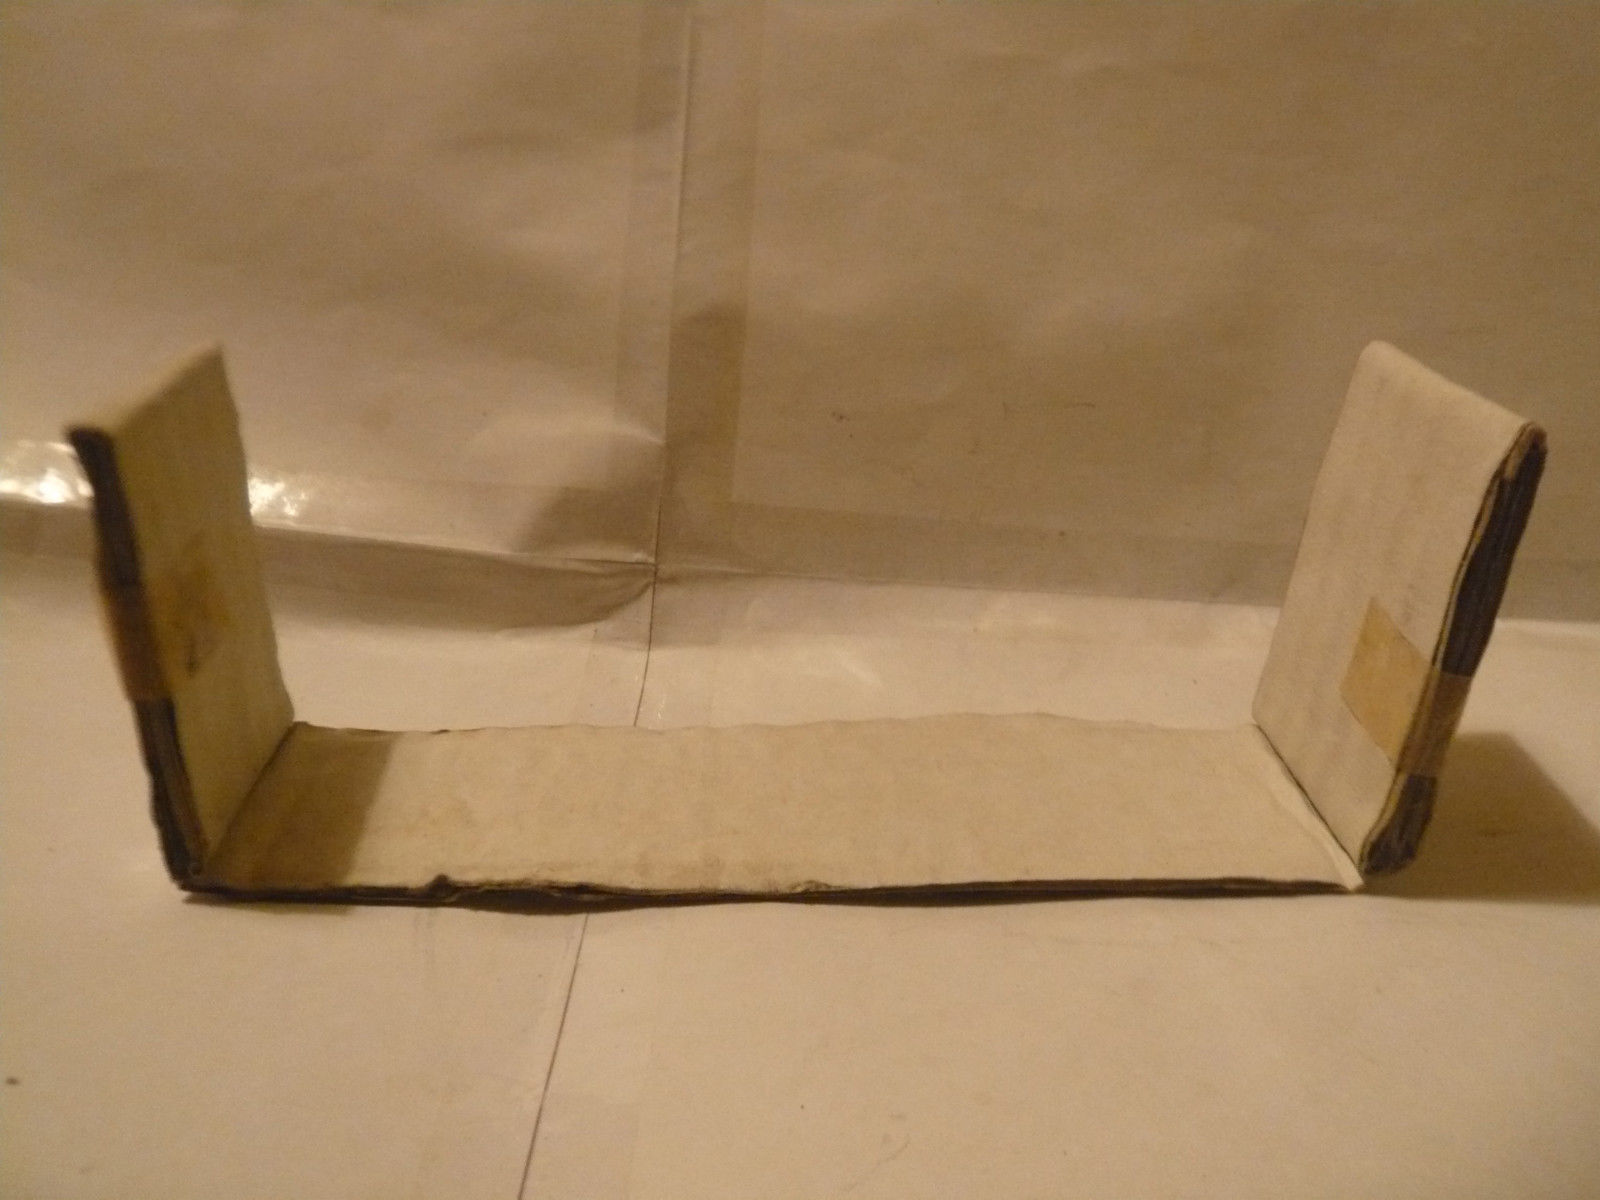 corgi-cardboard